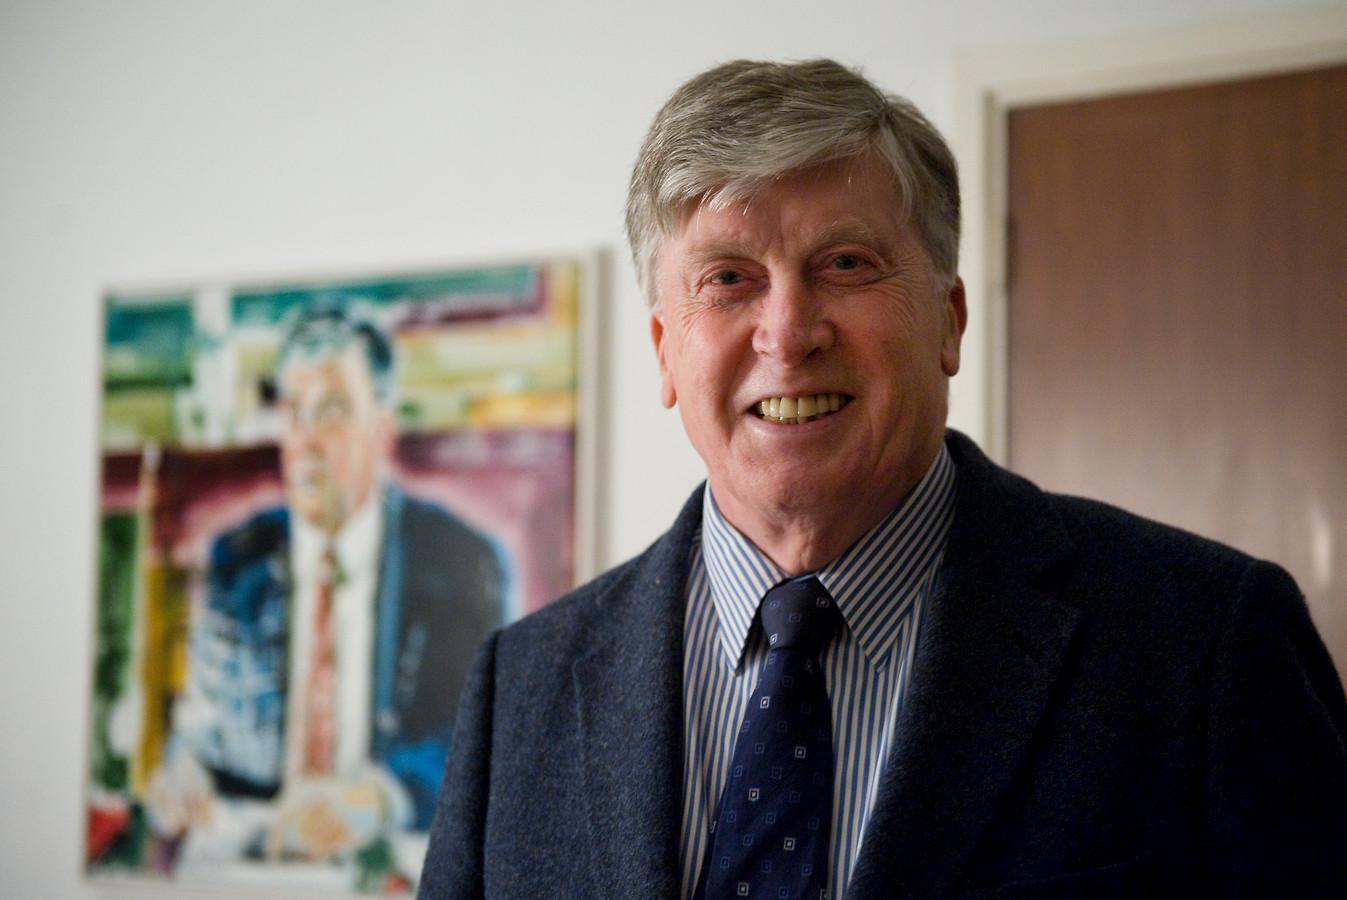 Olof Wullink